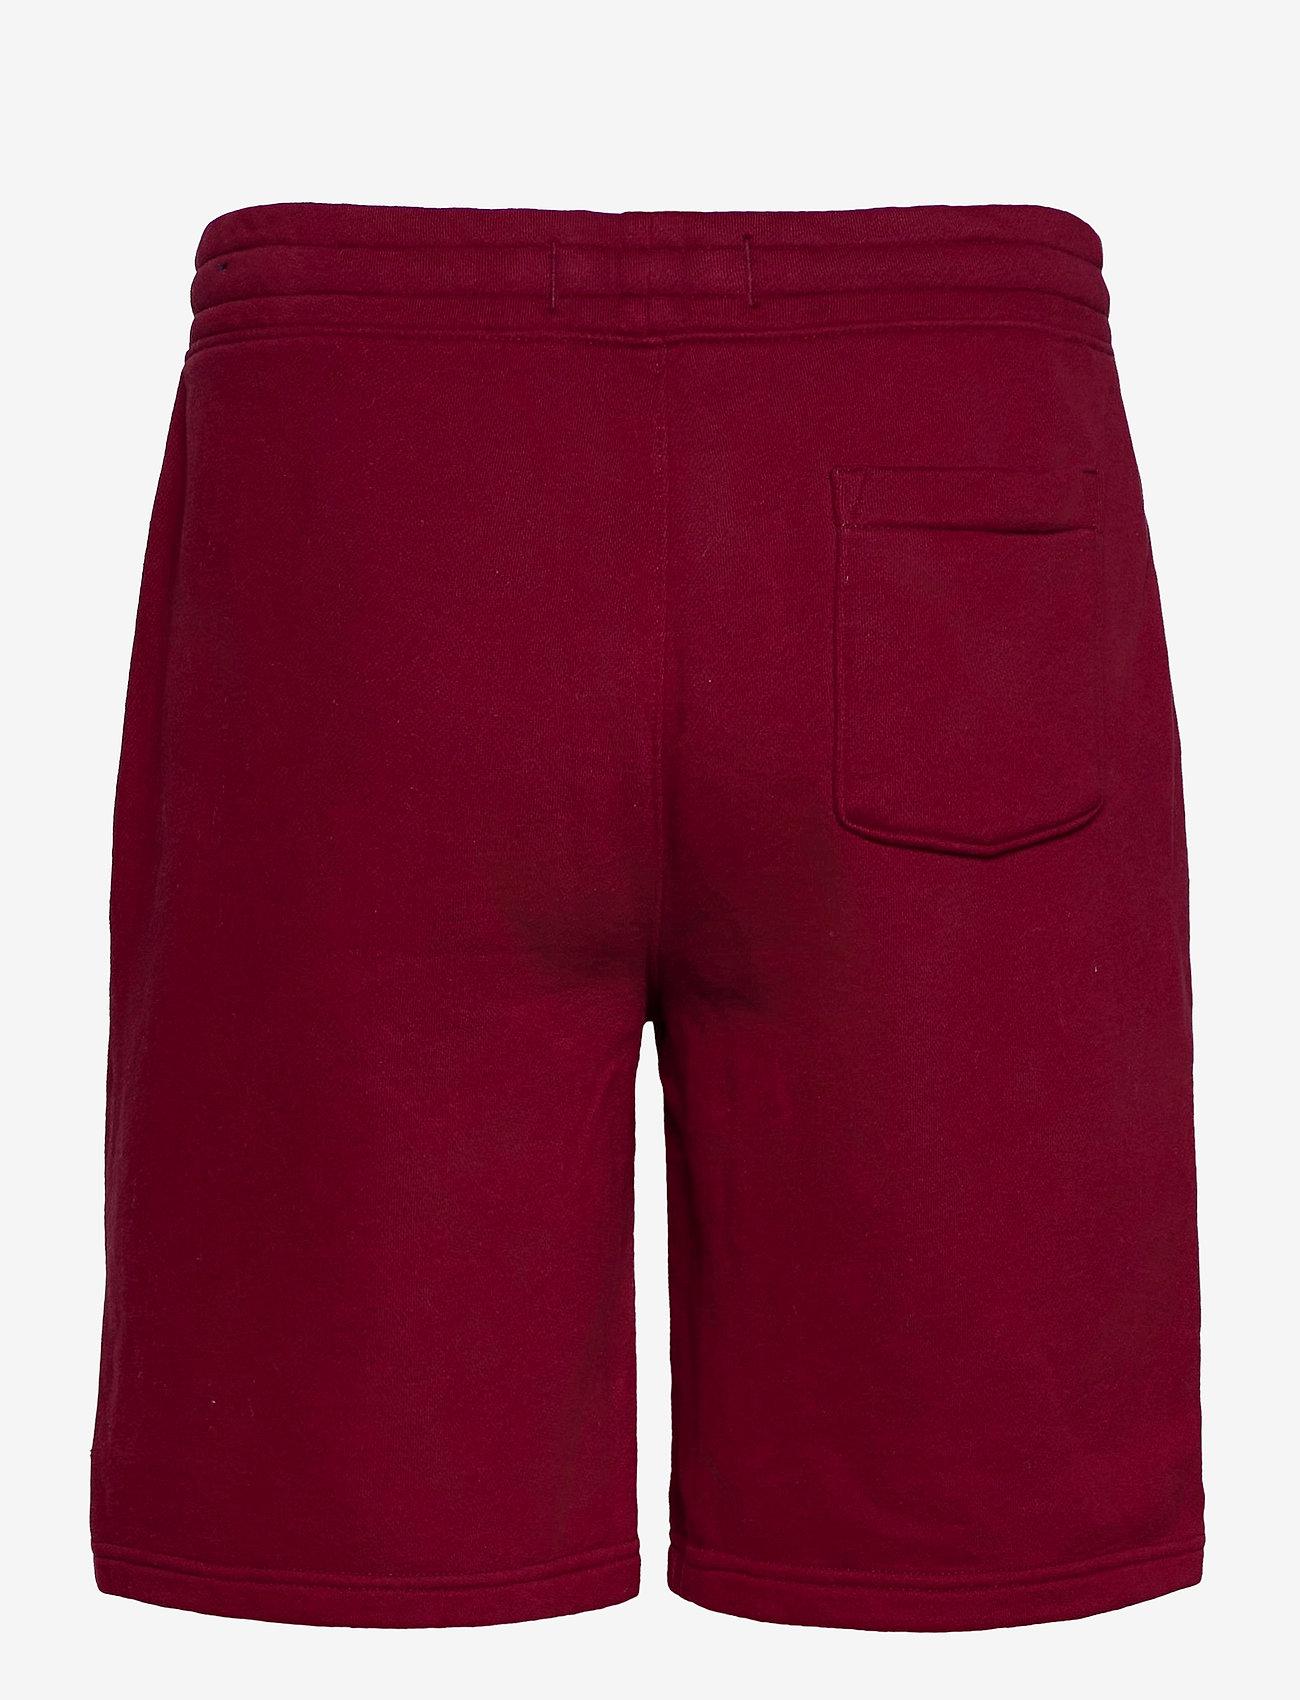 Hollister Tech Logo Shorts - Shorts BURGUNDY DD - Menn Klær